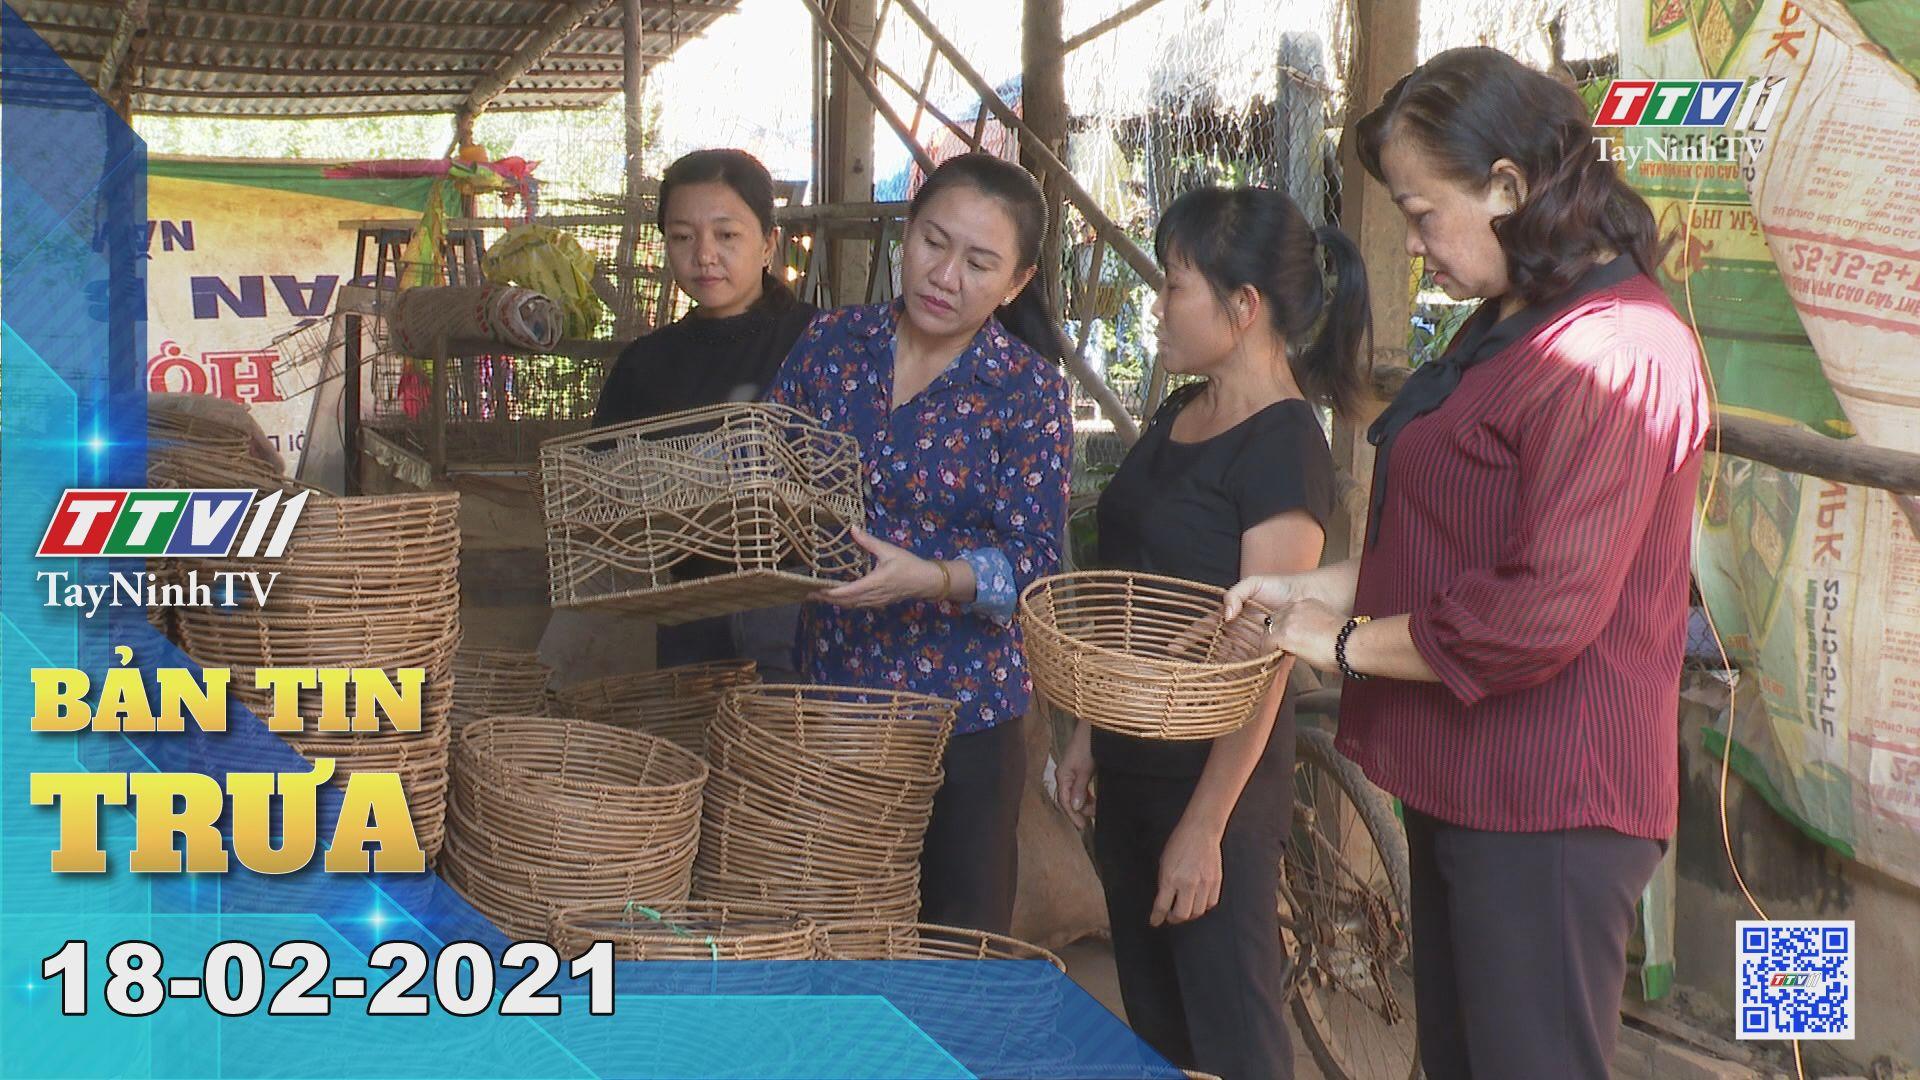 Bản tin trưa 18-02-2021 | Tin tức hôm nay | TayNinhTV